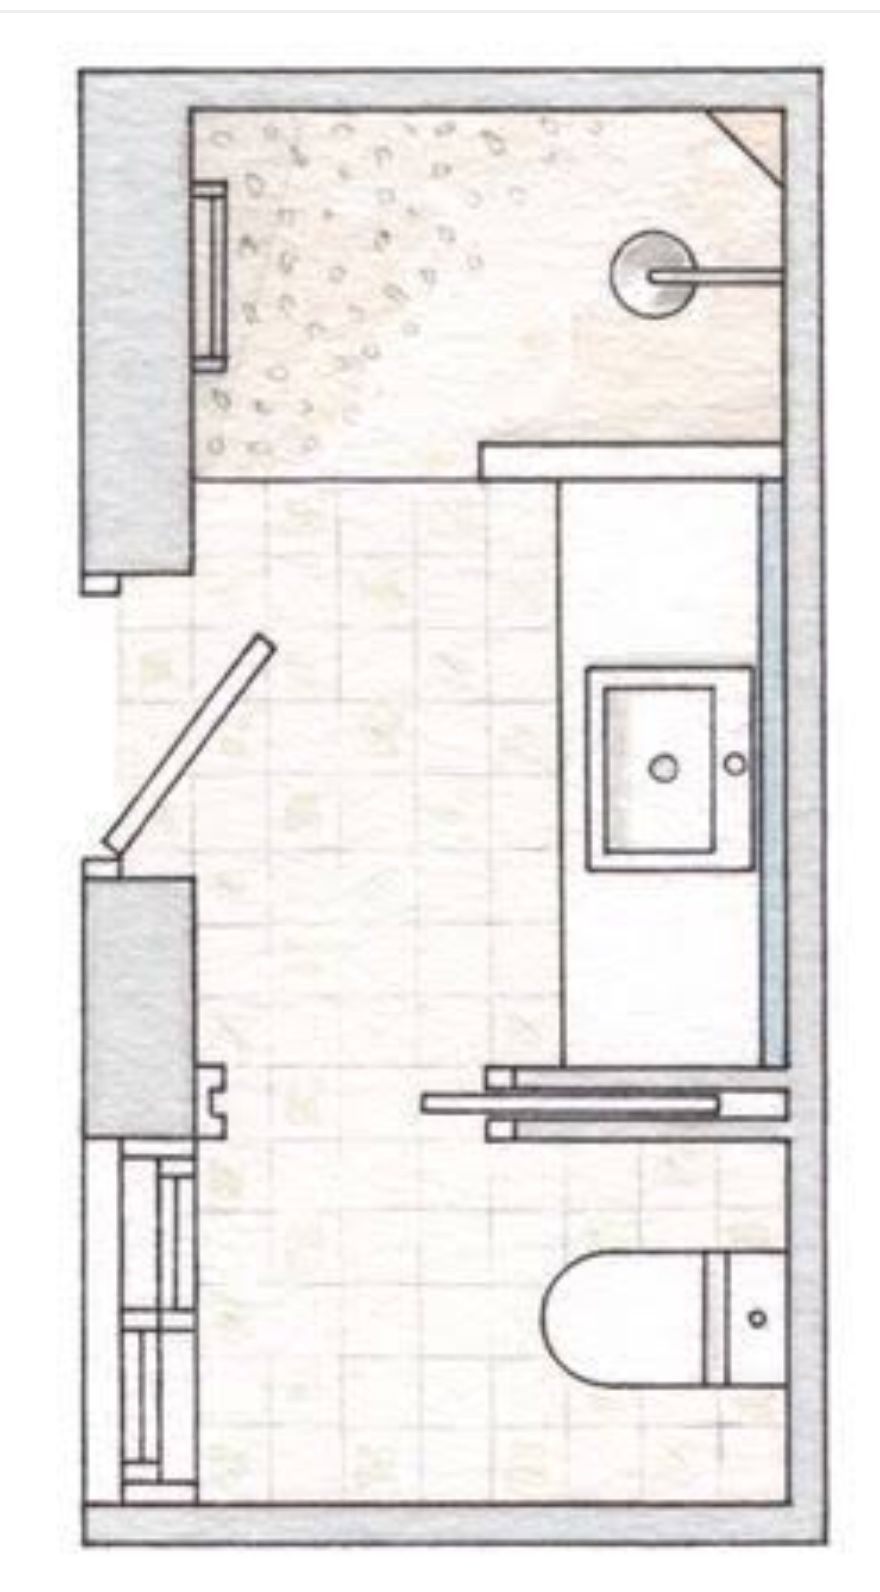 25 Minimalist Small Bathroom Ideas Feel The Big Space With Images Bathroom Layout Plans Bathroom Floor Plans